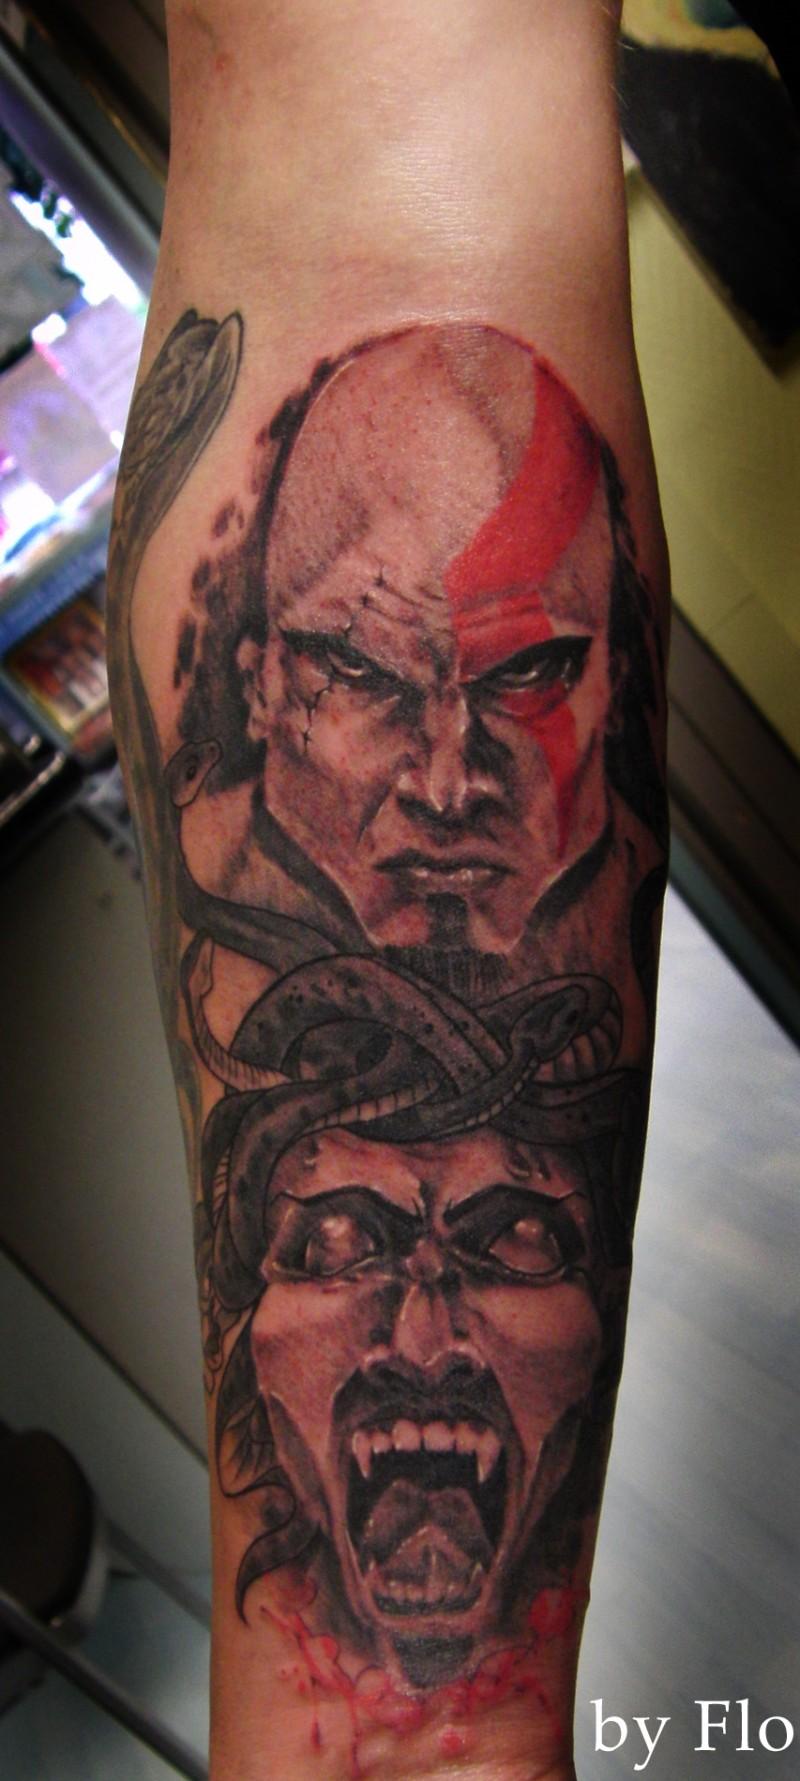 Homemade like colored big barbarian portrait tattoo on forearm with Medusa head